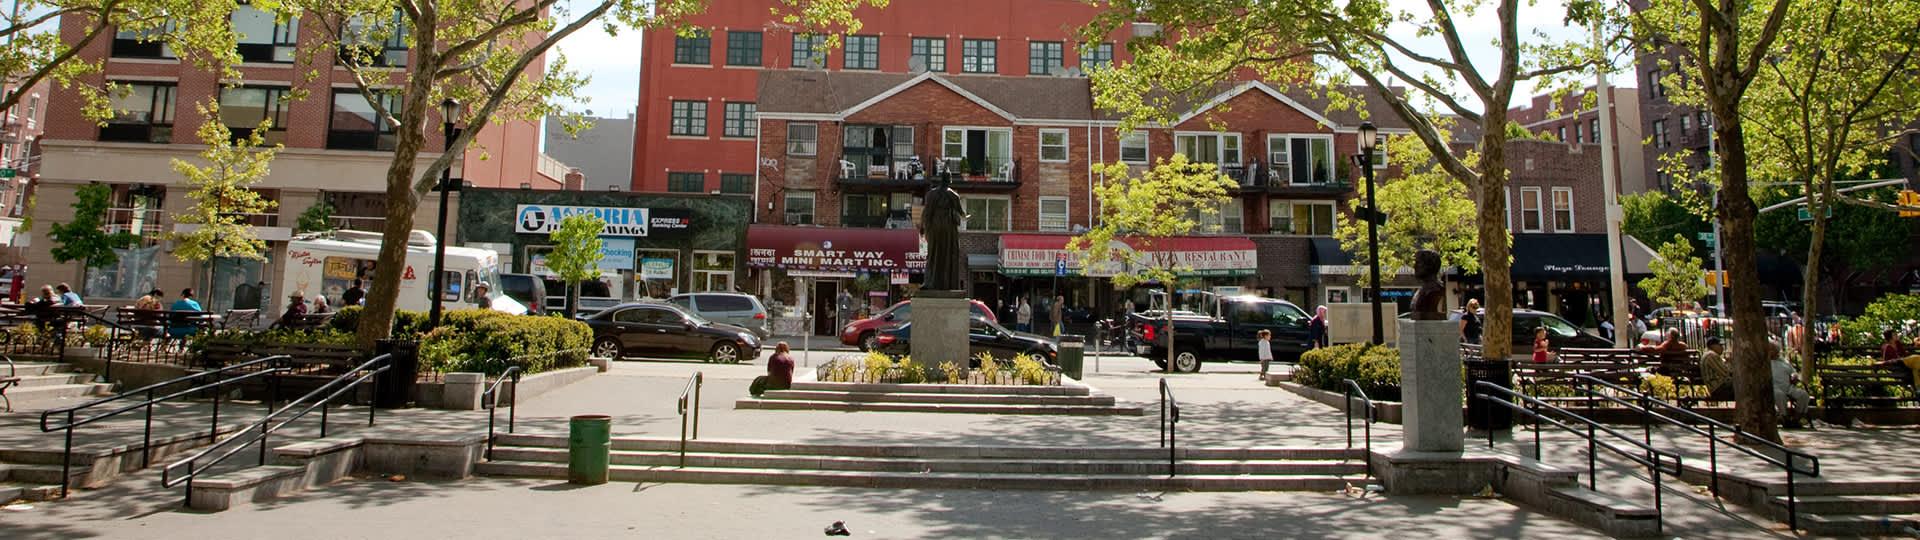 Athens Square Park, Astoria, Queens